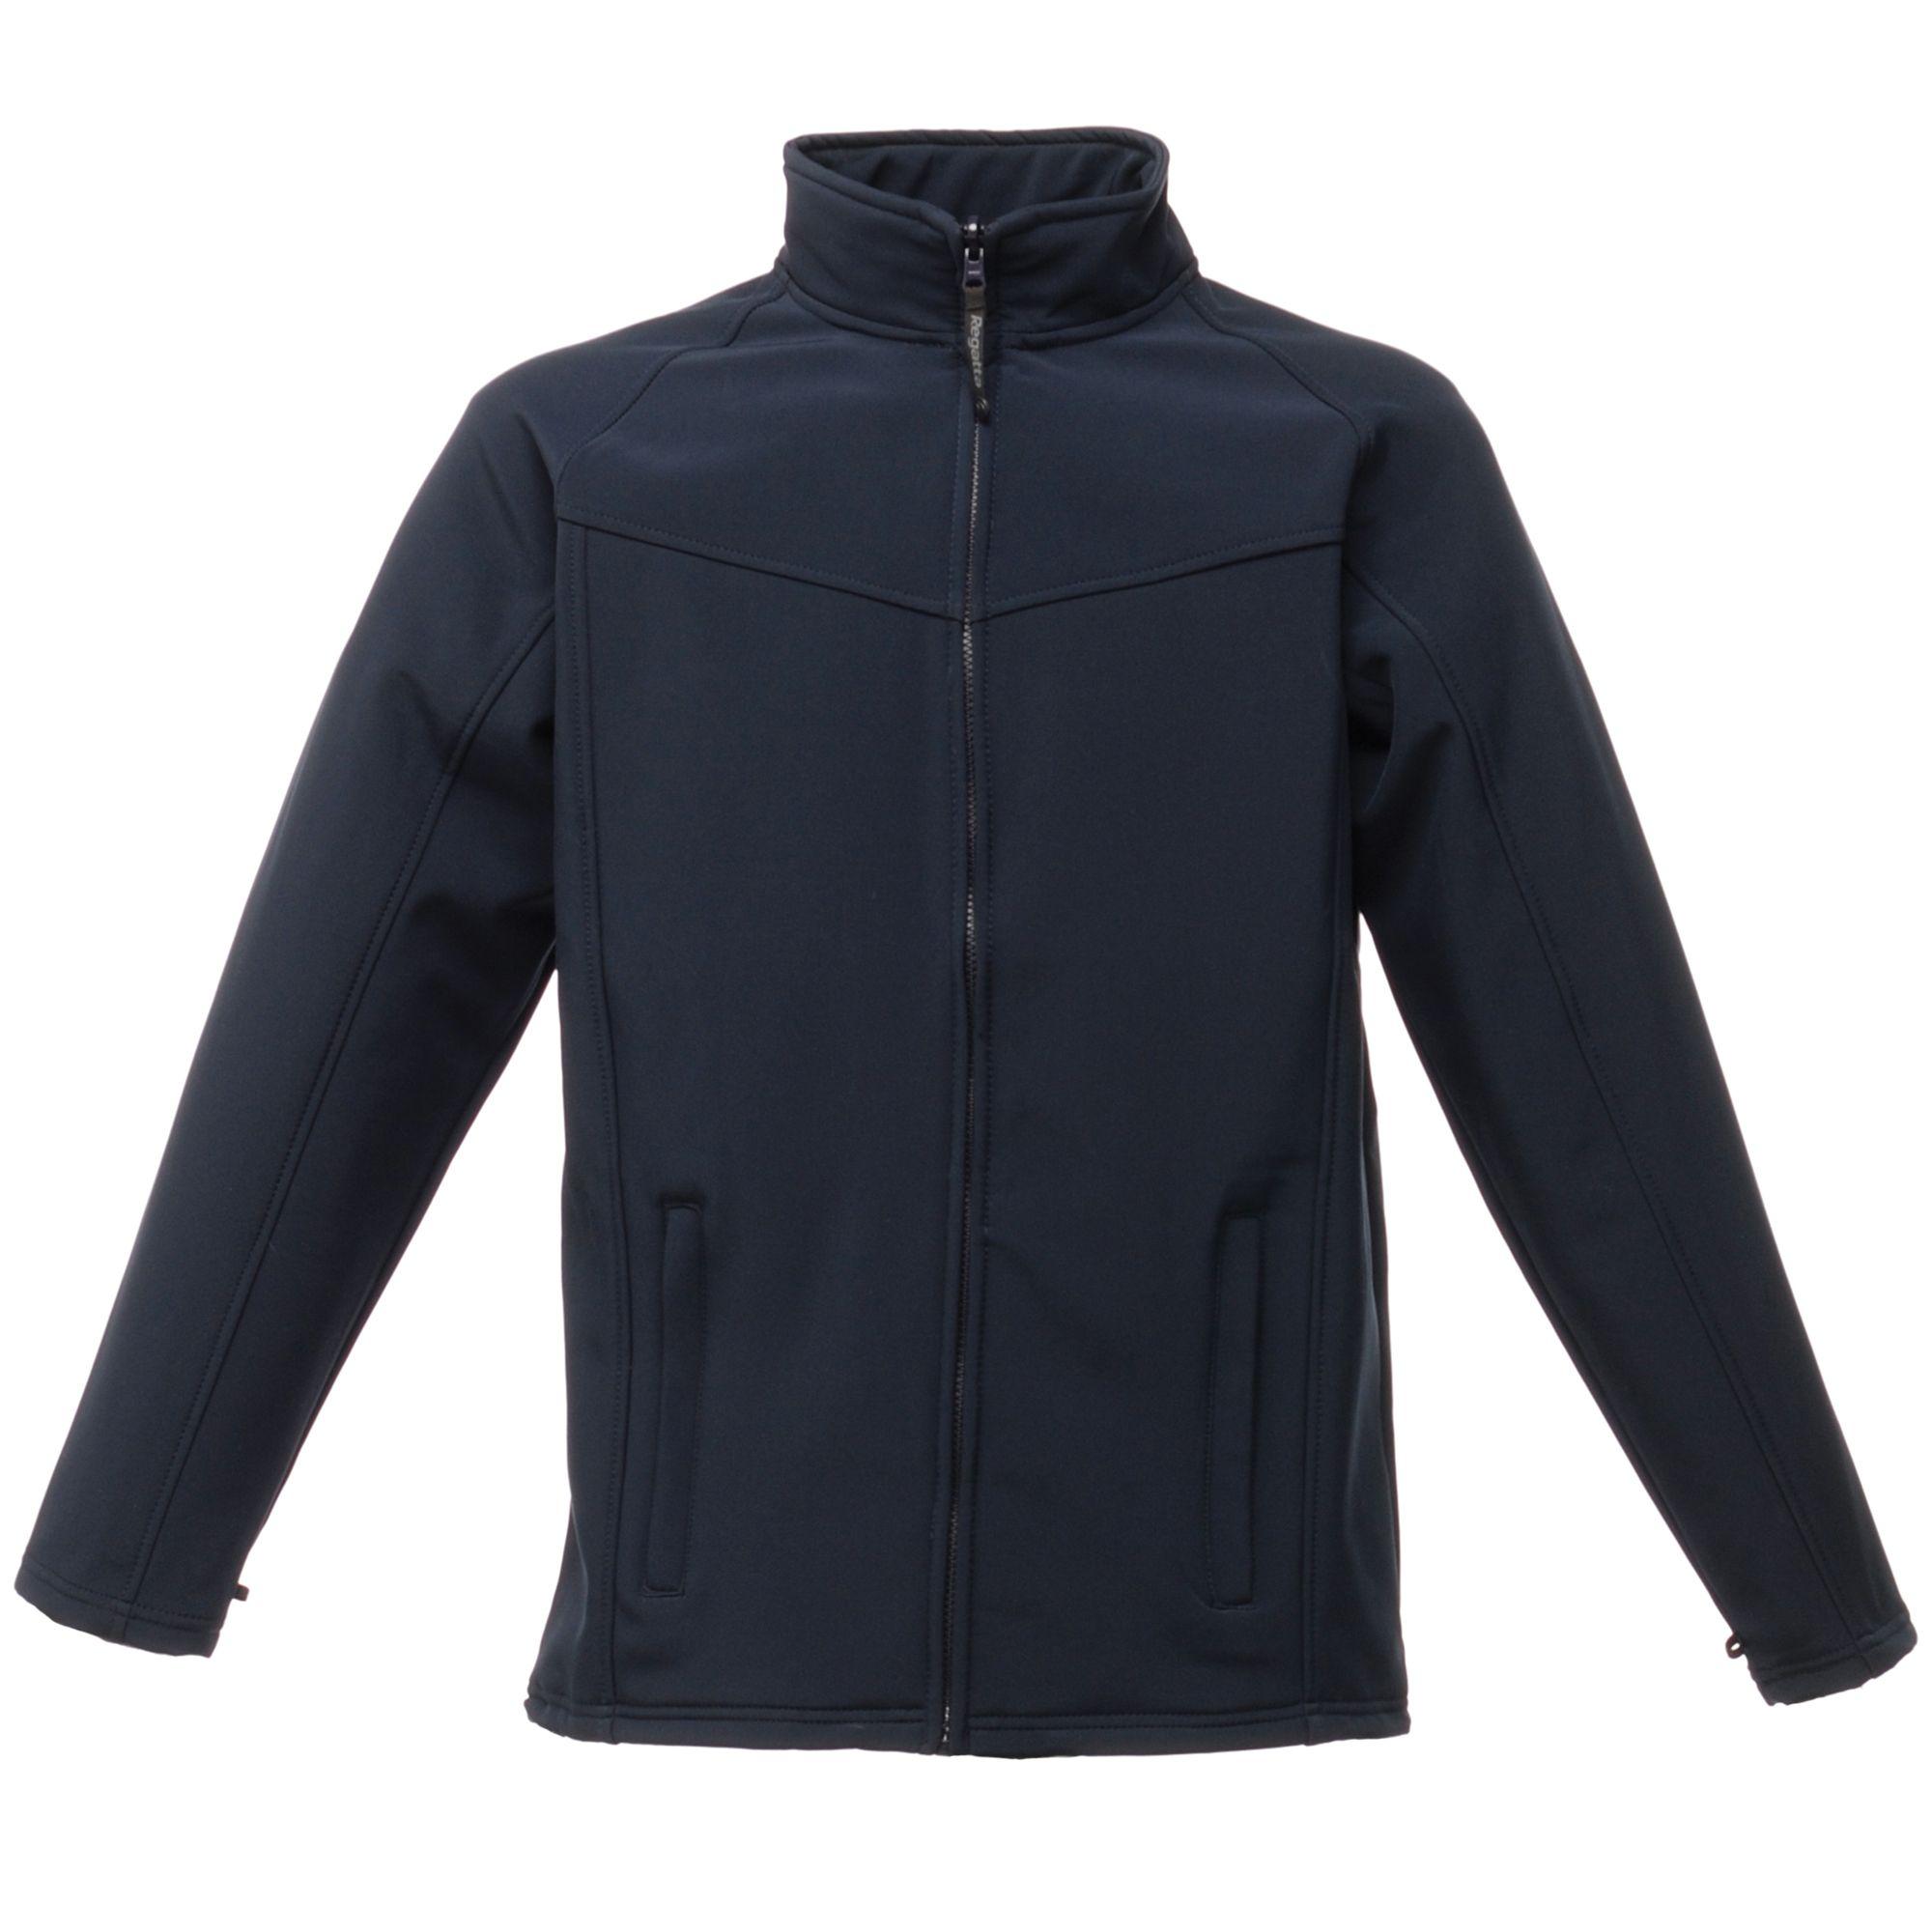 Regatta Uproar Mens Softshell Wind Resistant Fleece Jacket